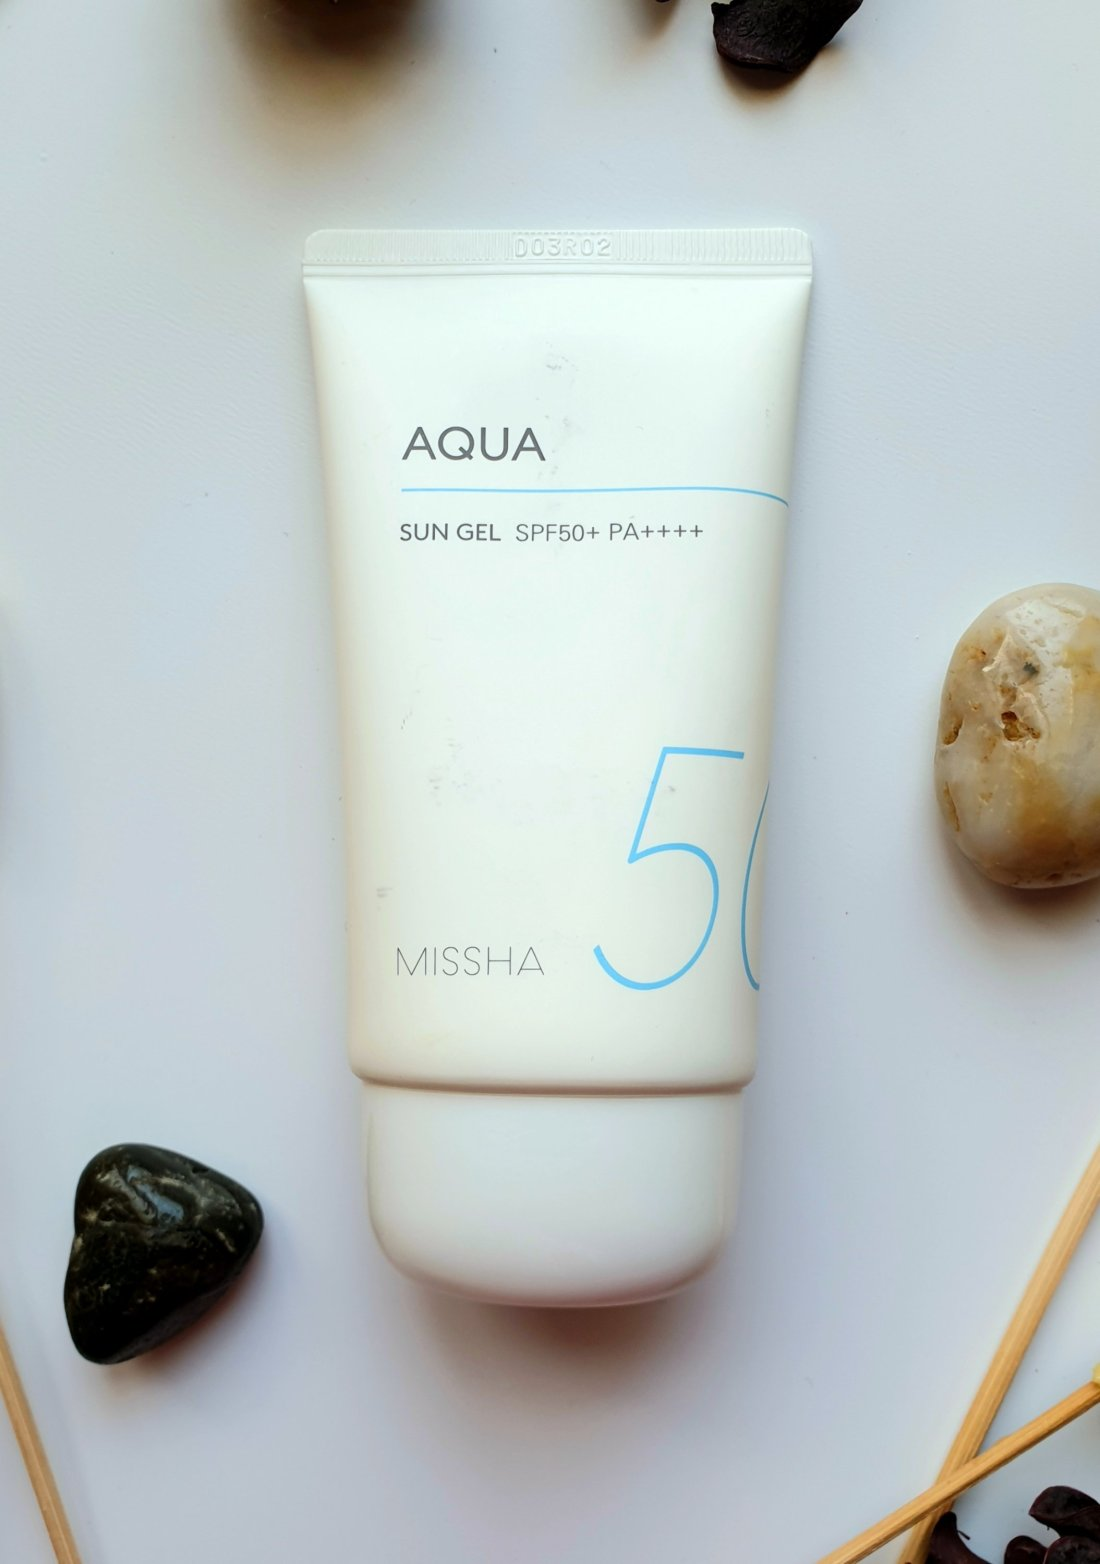 Image result for missha aqua sun gel myskincareregime